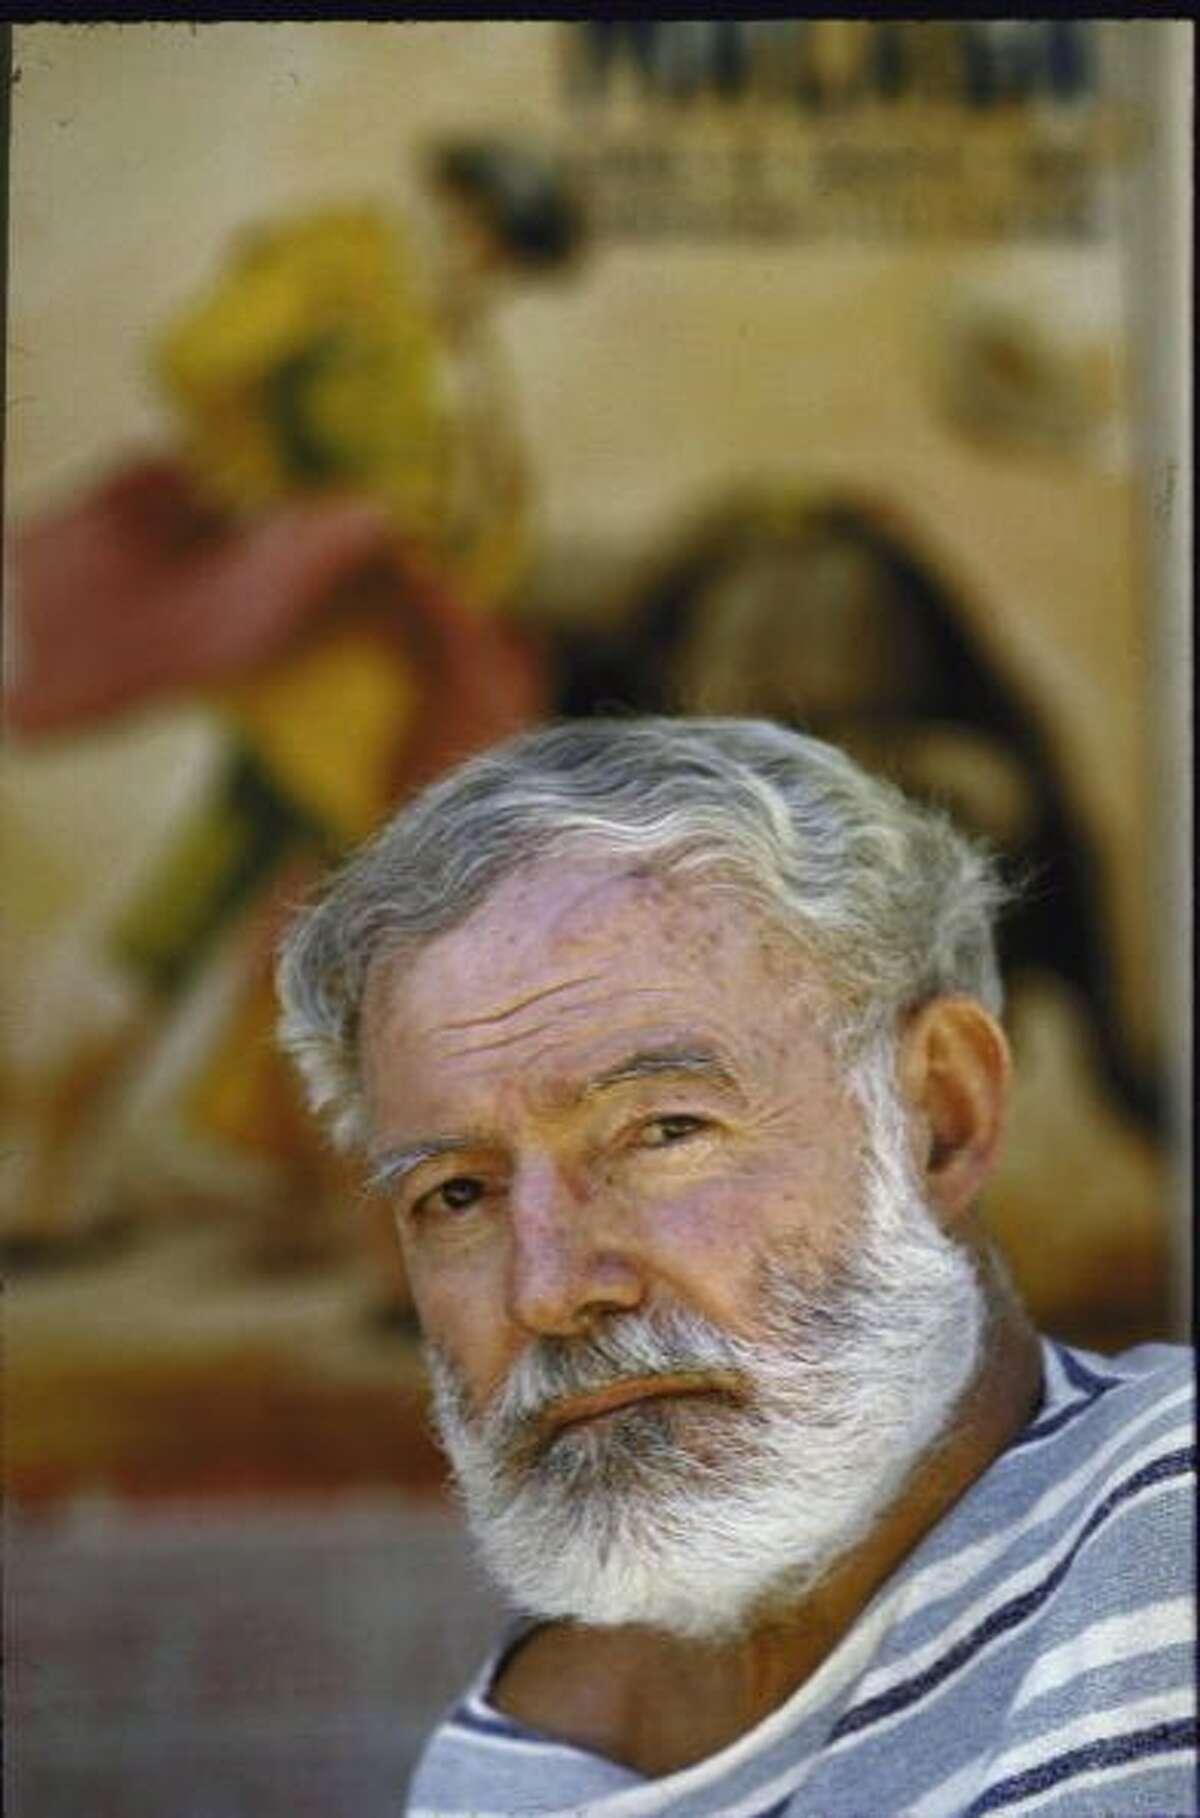 Ernest Hemingway nearMálaga,Spain, in 1960, a year before his death.